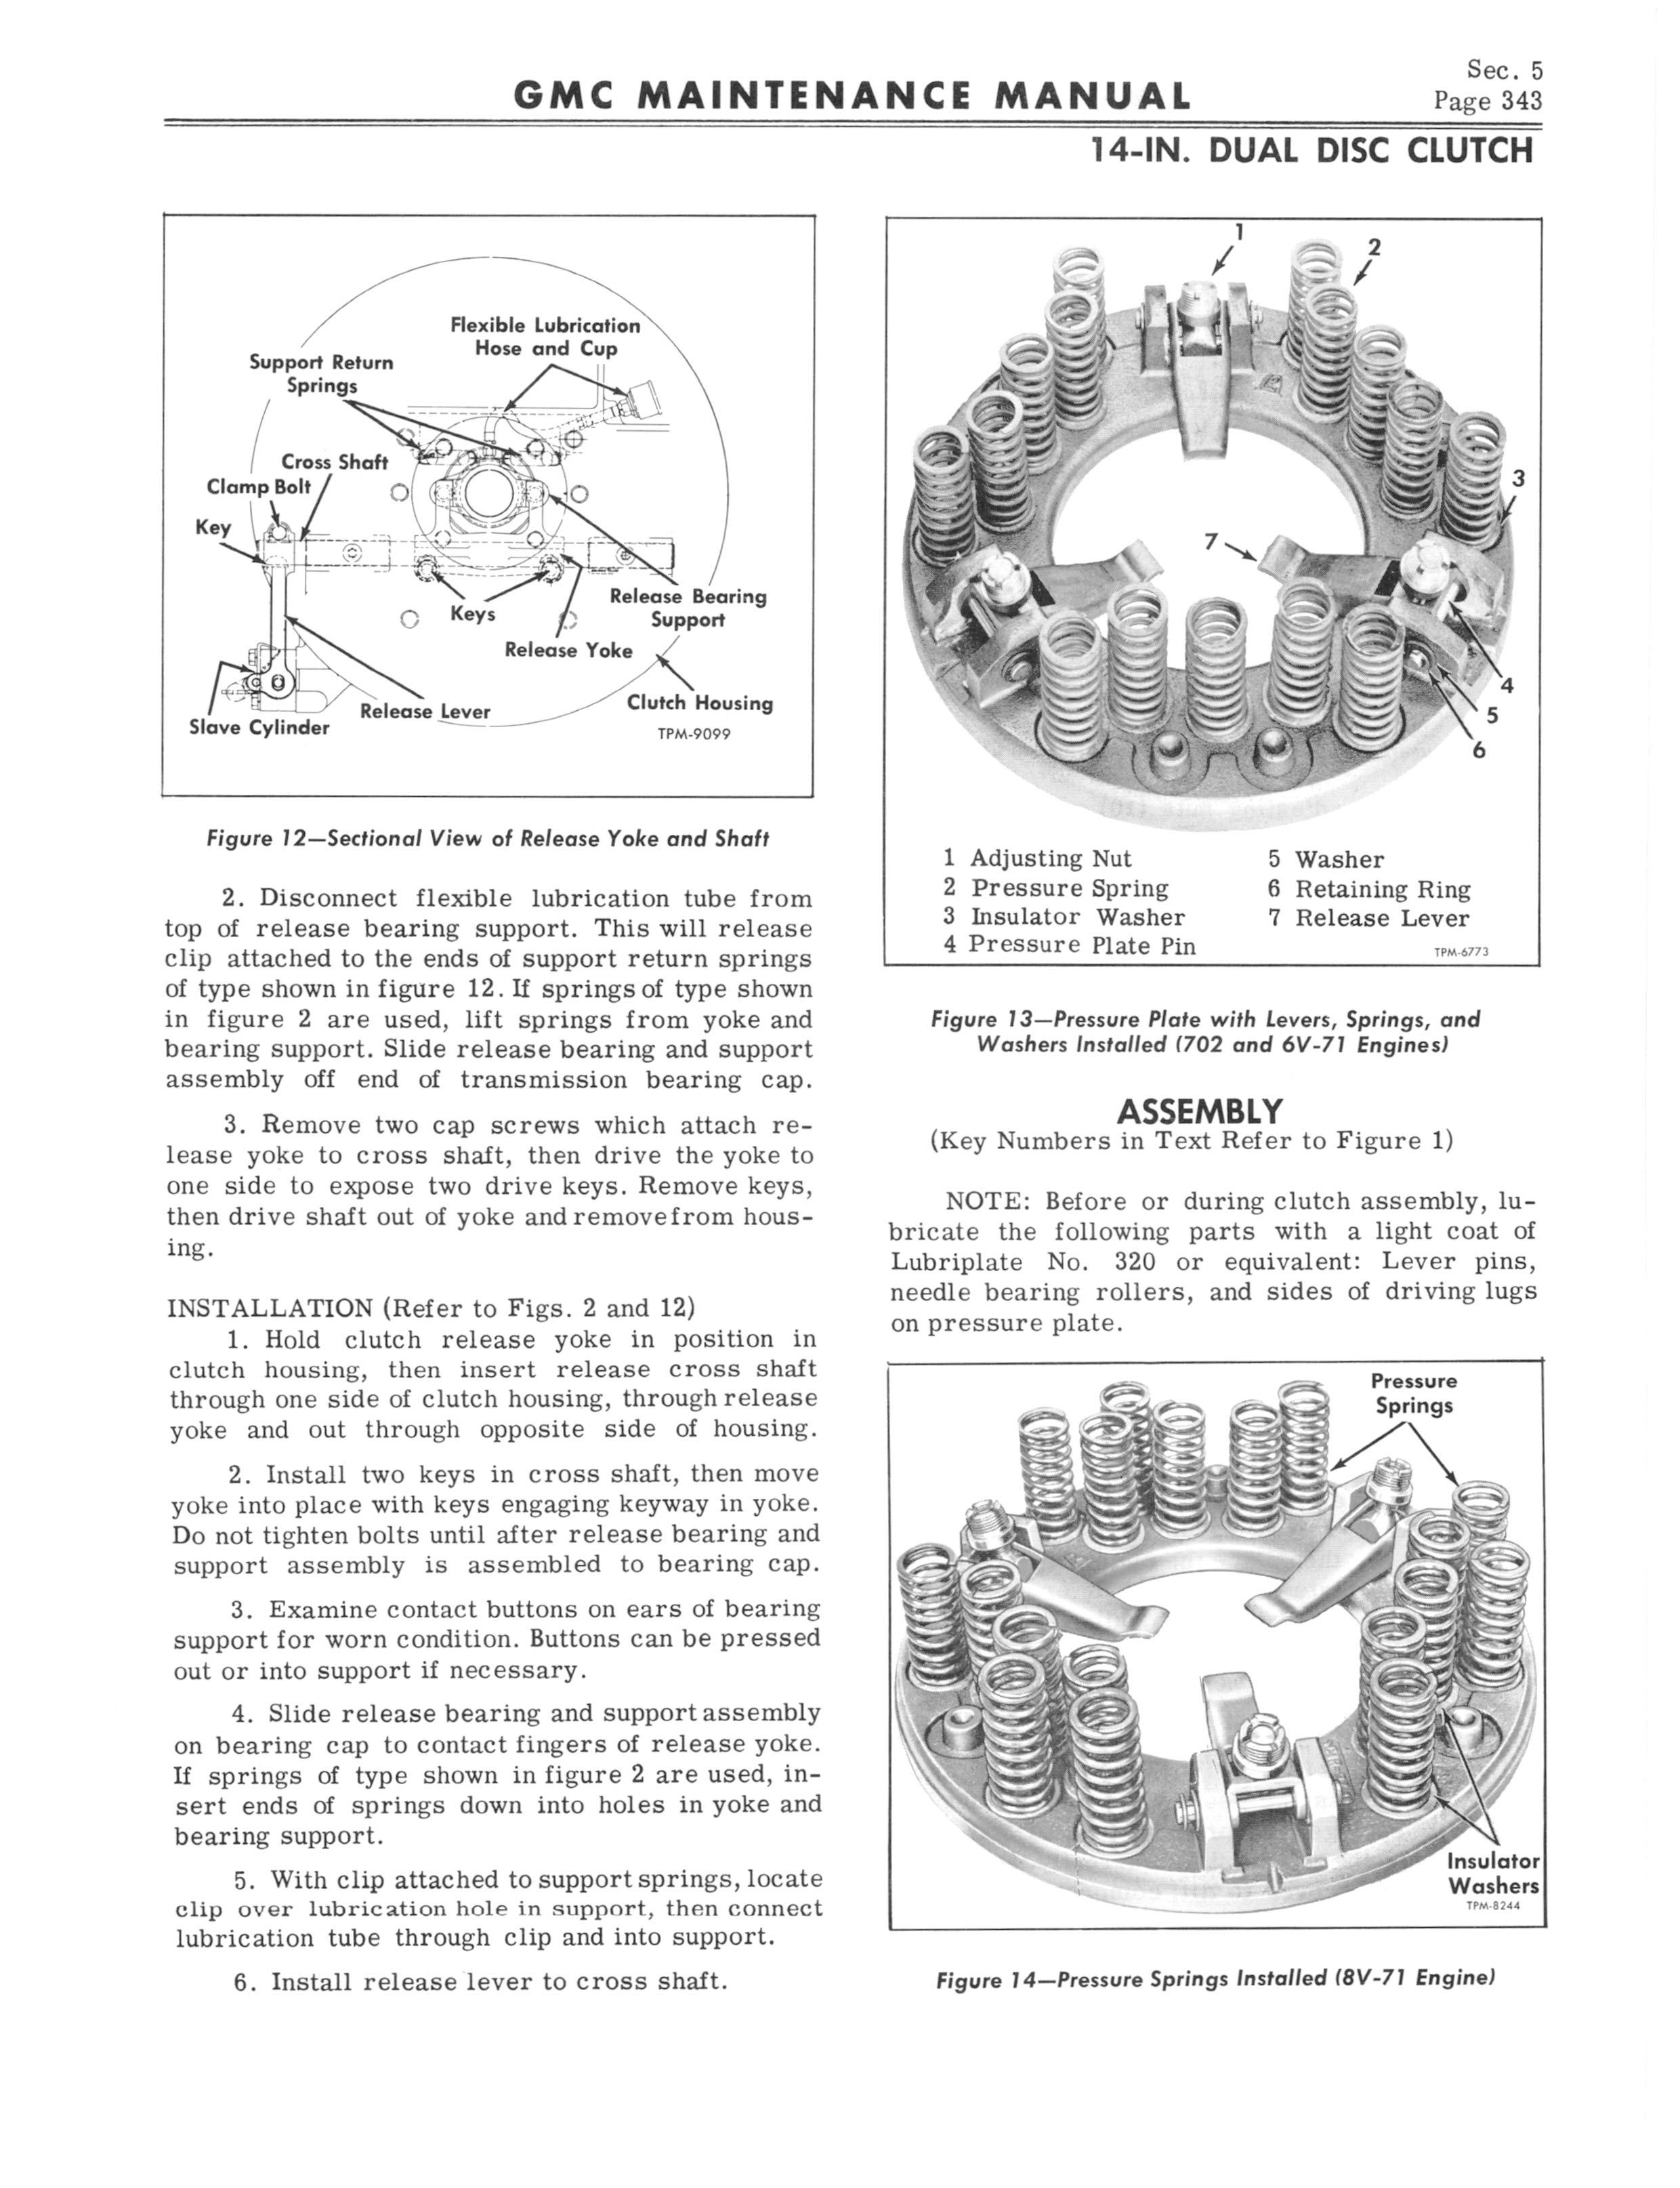 1964 GMC Series 5500-7100 Maintenance Manual page 351 of 834